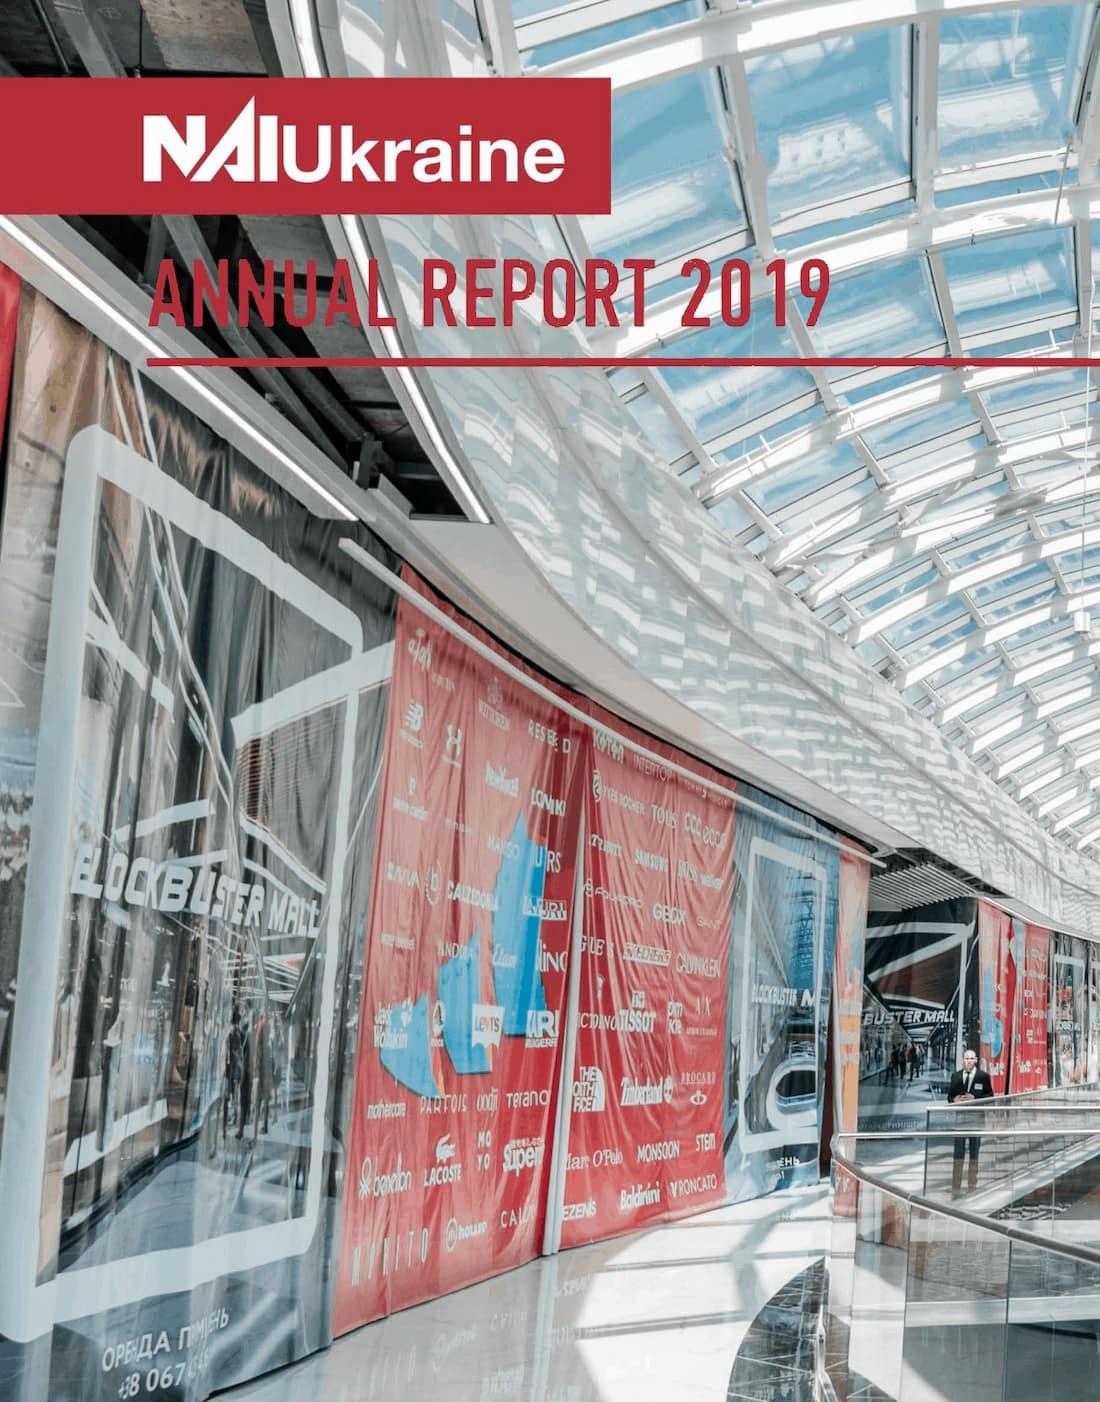 Annual Report NAI Ukraine 2019